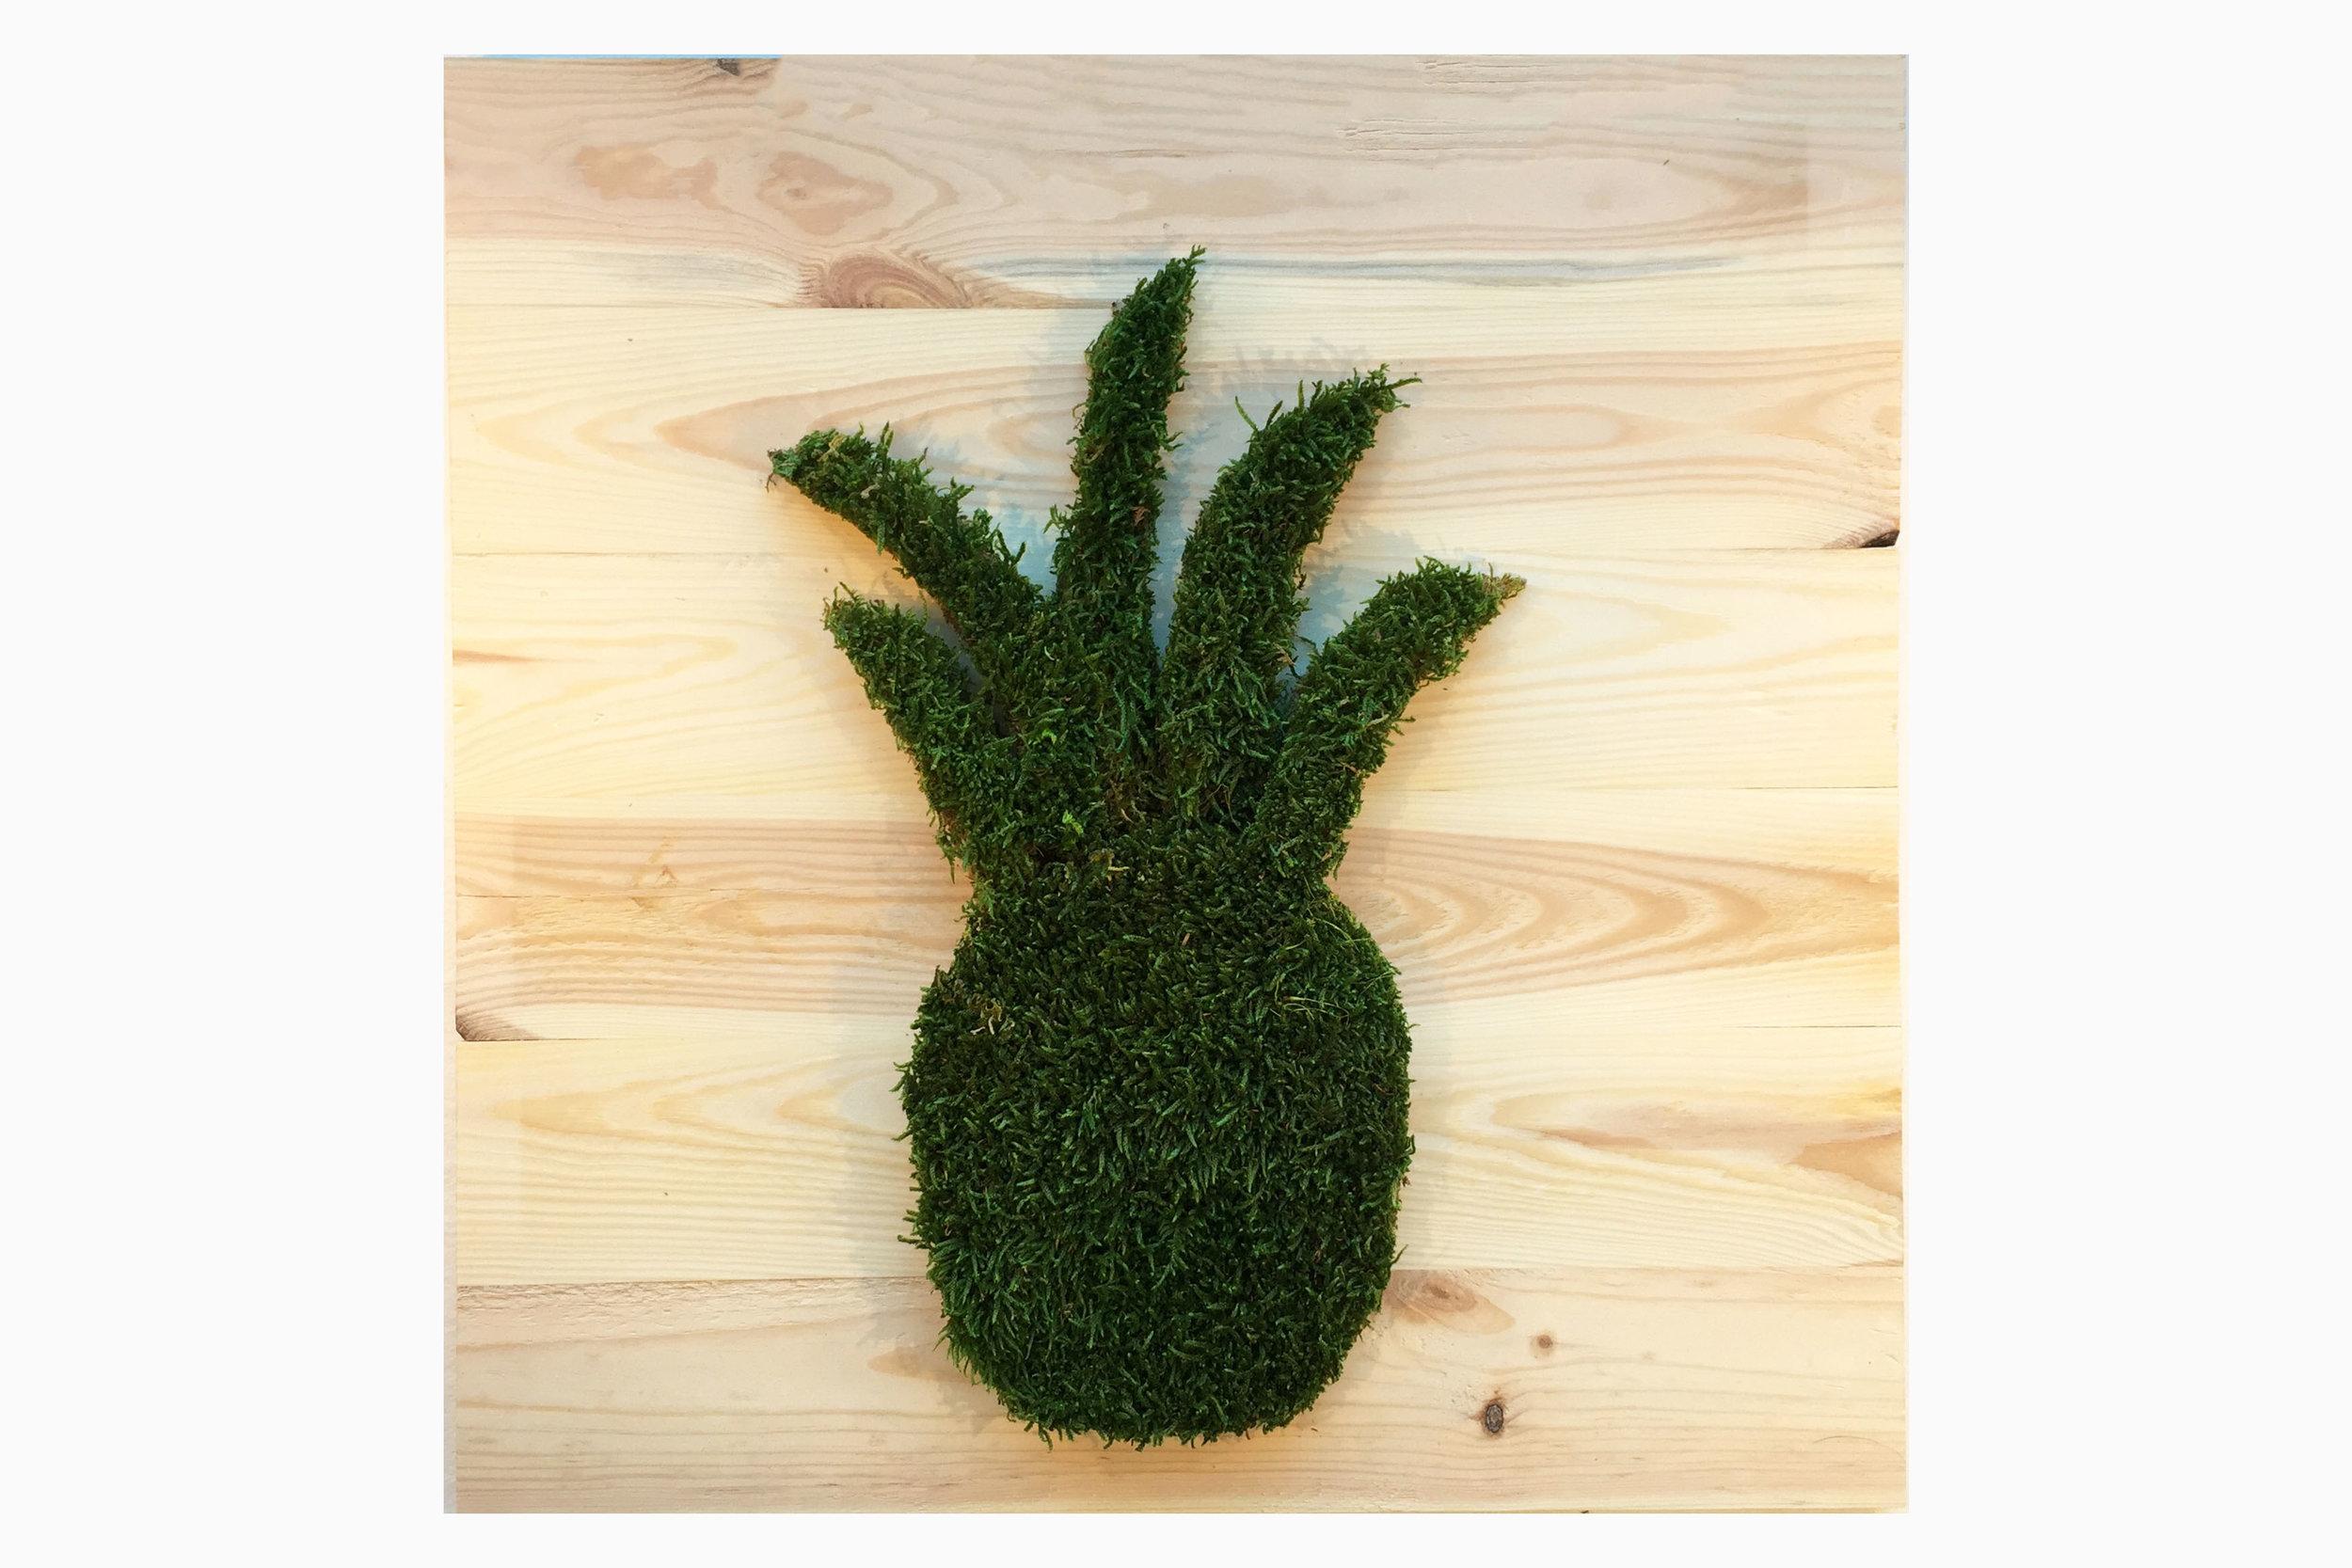 cadre-vegetal-ananas-planche-hoai 2.jpg